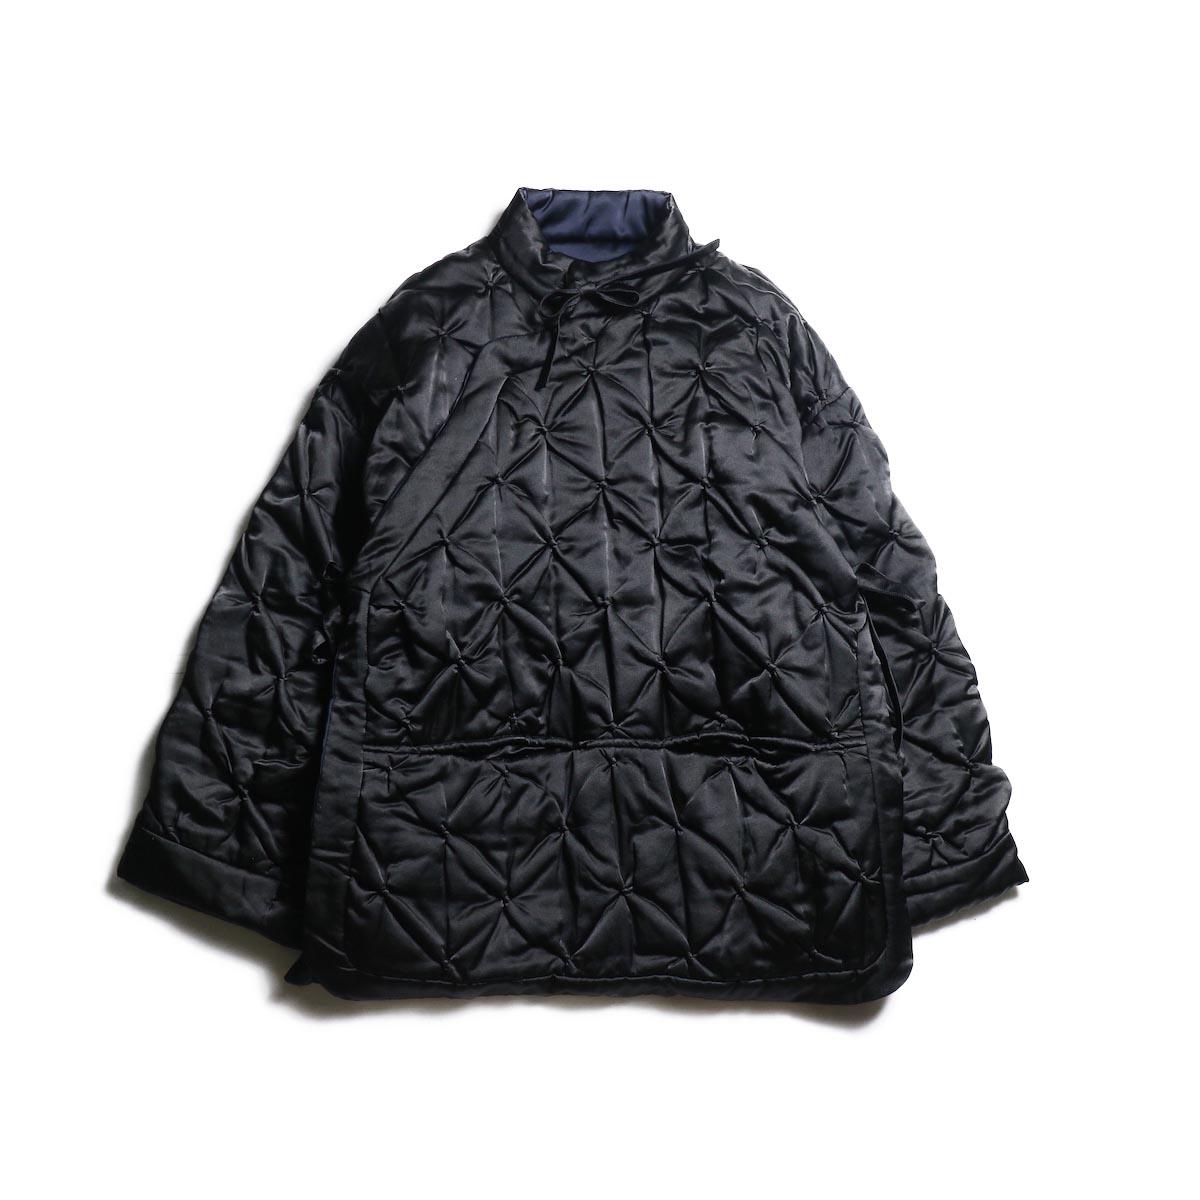 FUMIKA UCHIDA / Silk Cotton Quilt Futon Jacket -Black